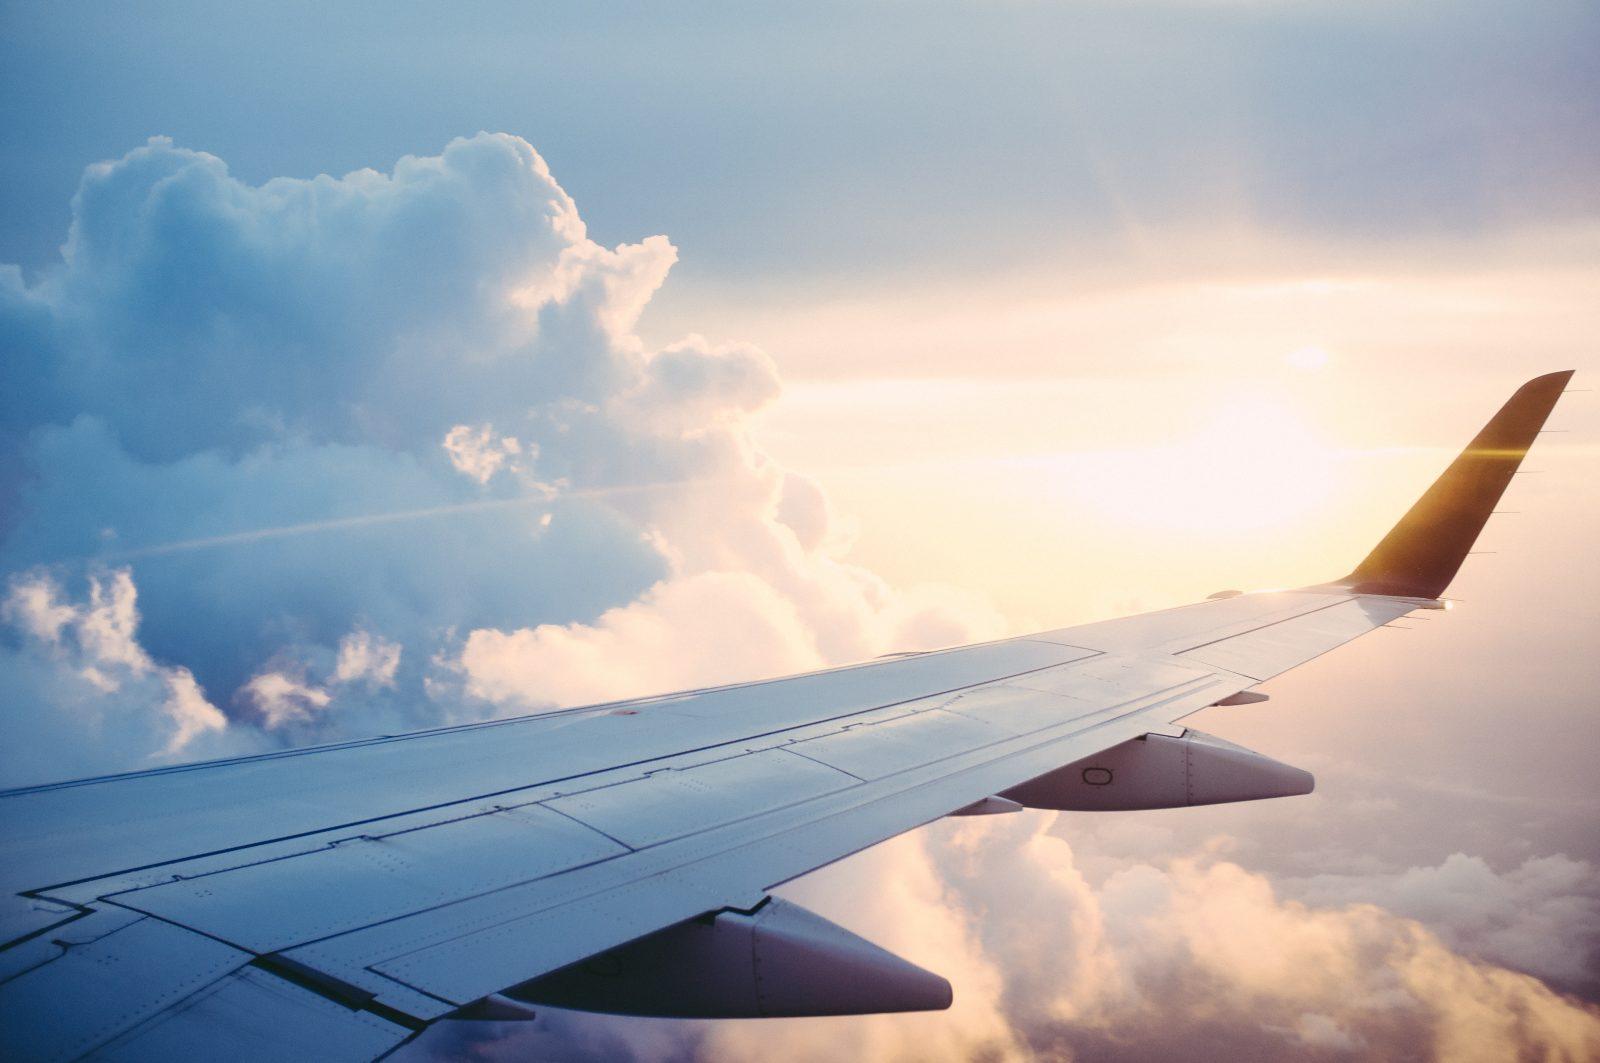 TSA Monitoring and Documenting Innocent Behavior With Quiet Skies Program